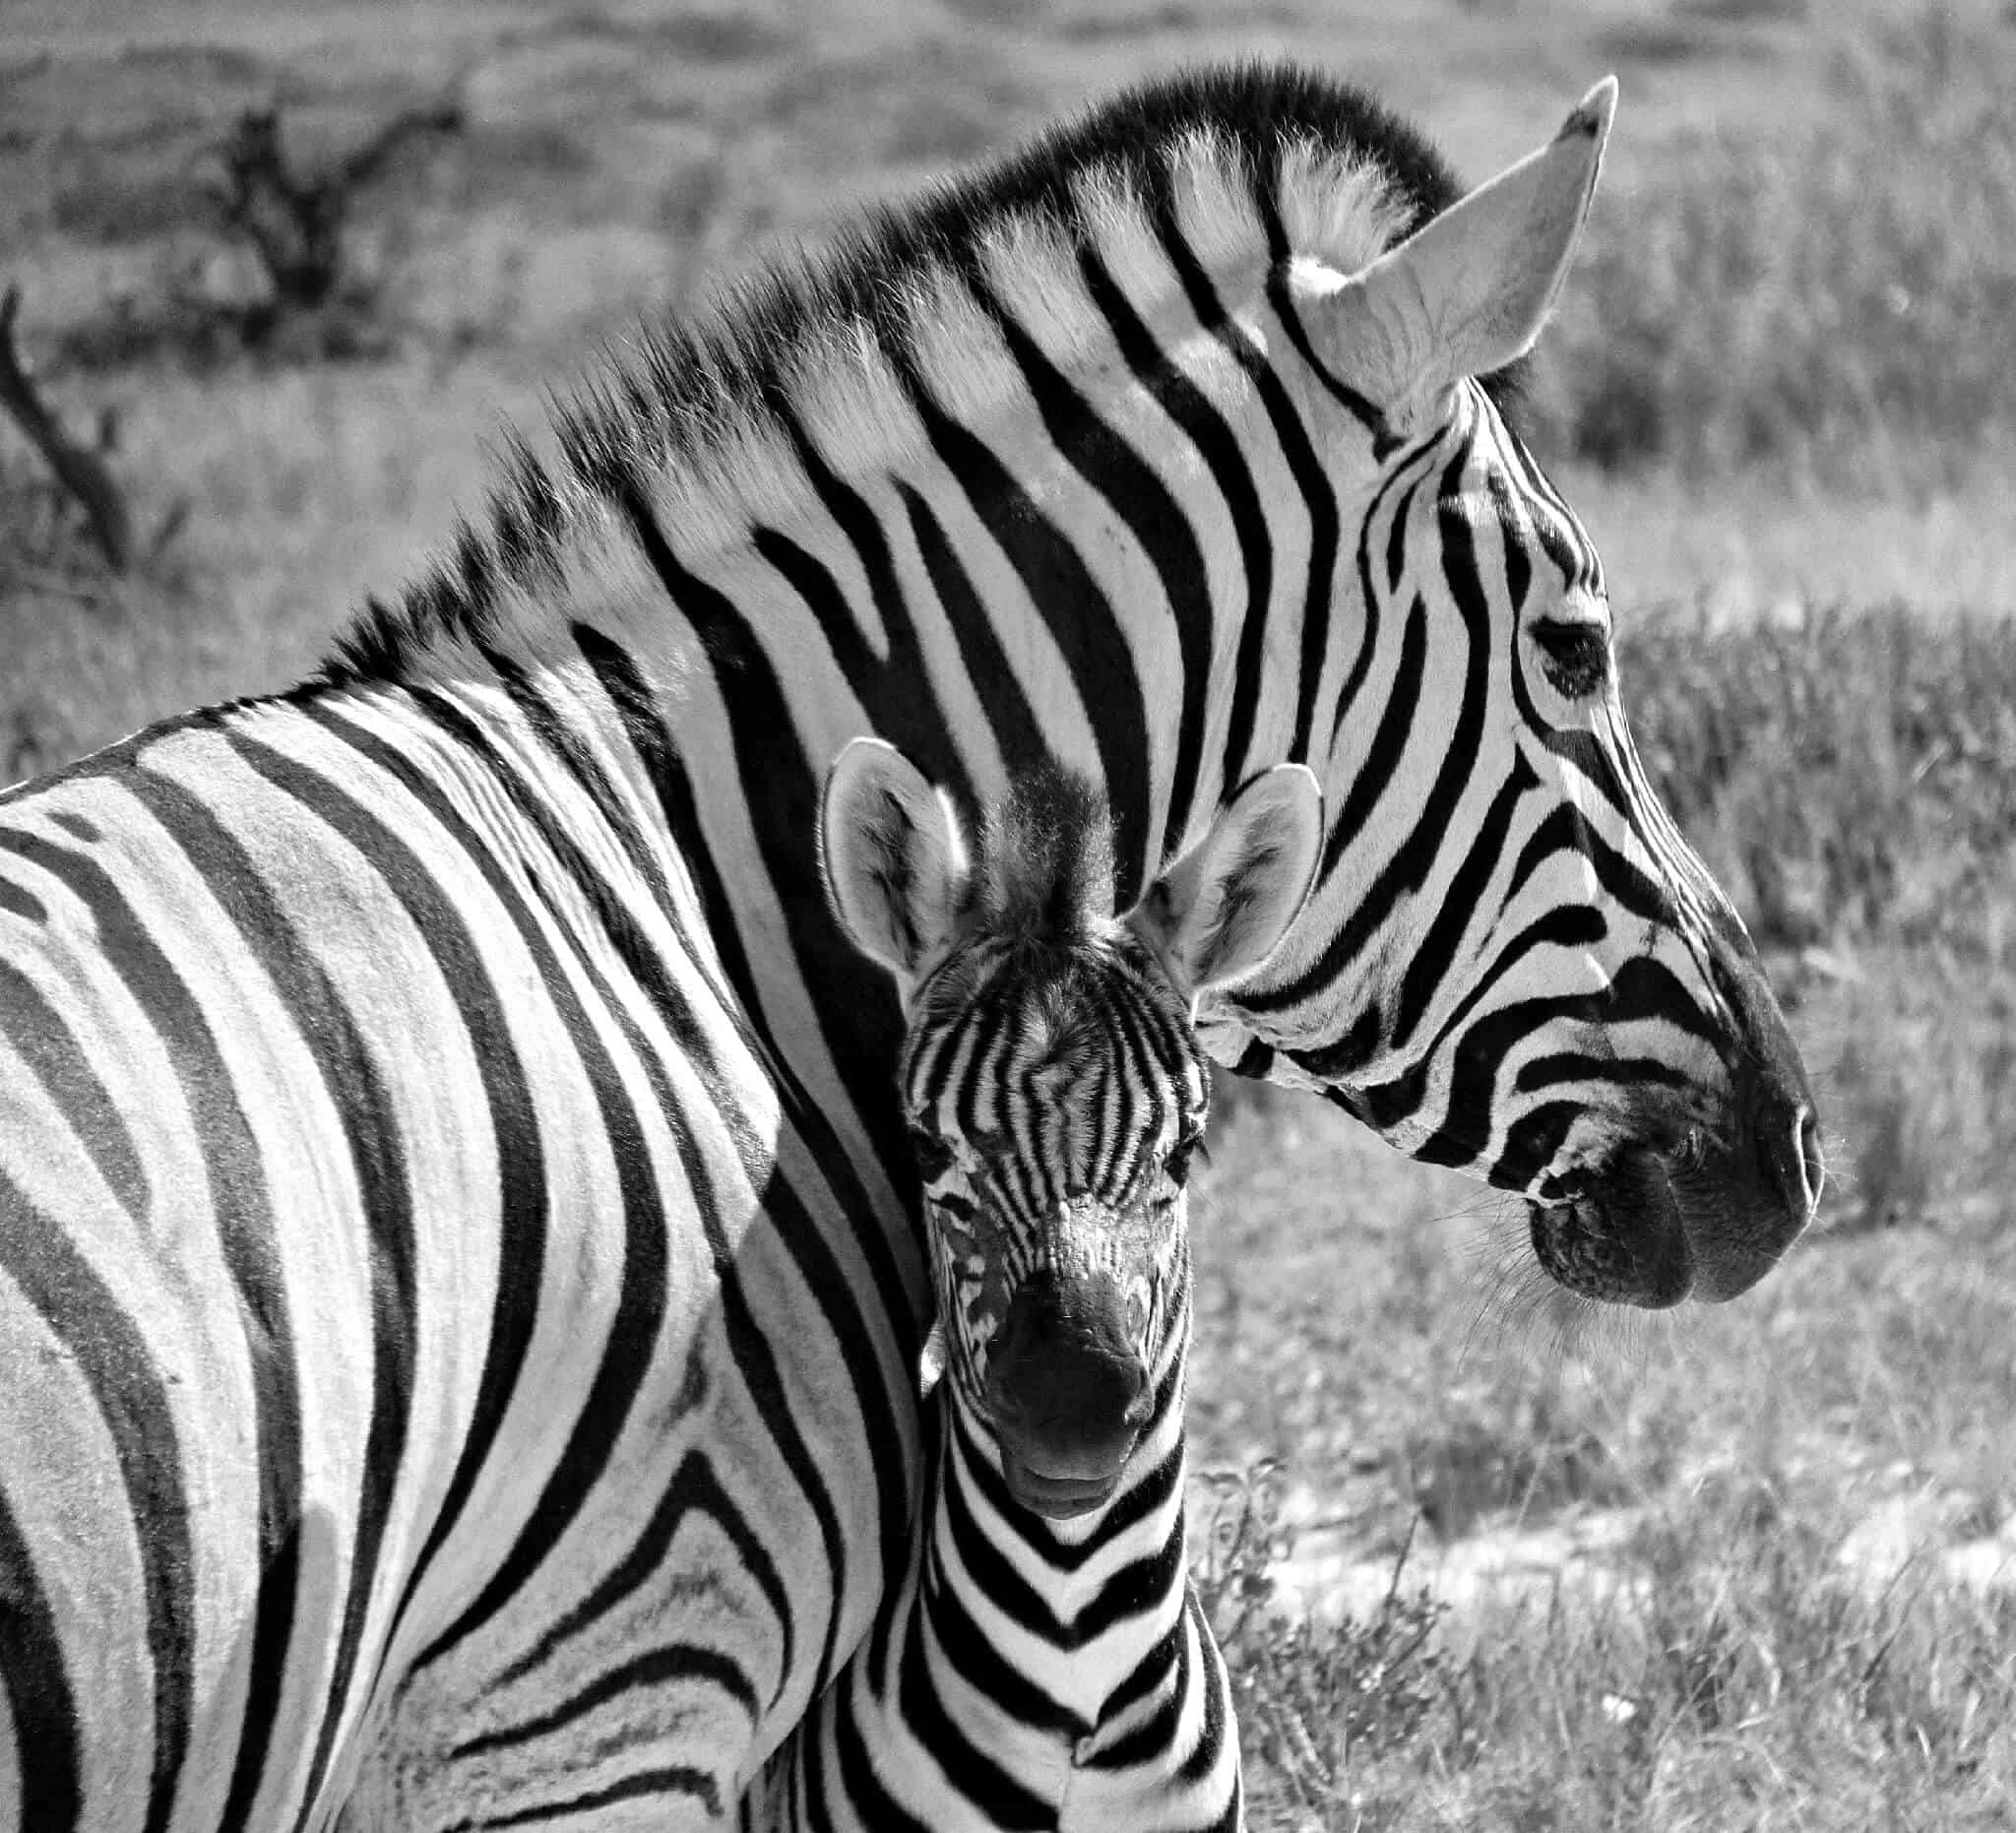 Zebra and Baby, Namibia